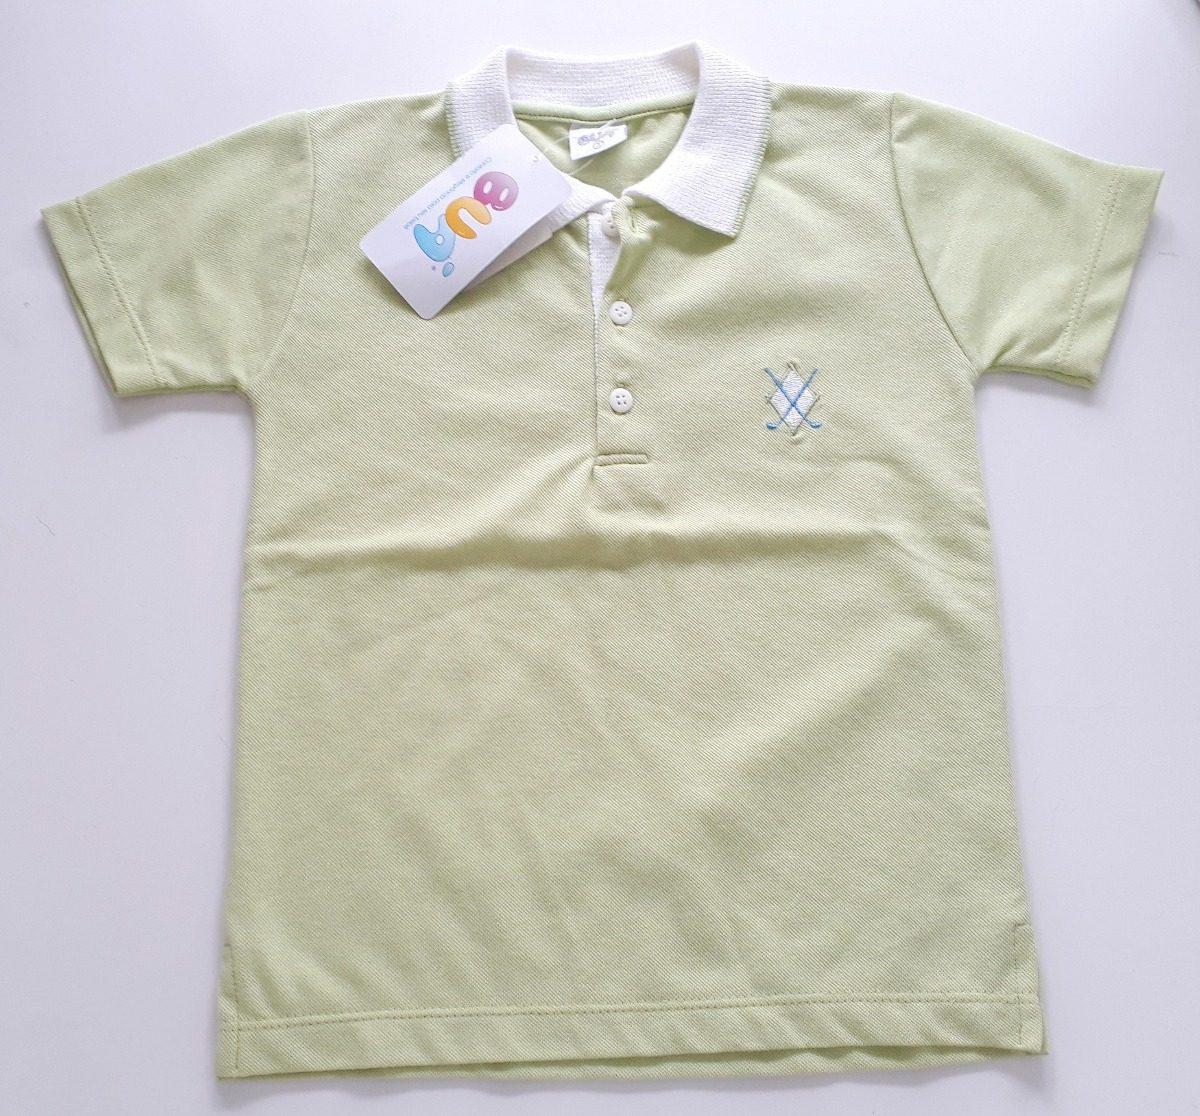 7b4dfda23 camiseta polo manga curta infantil masculino buá. Carregando zoom.